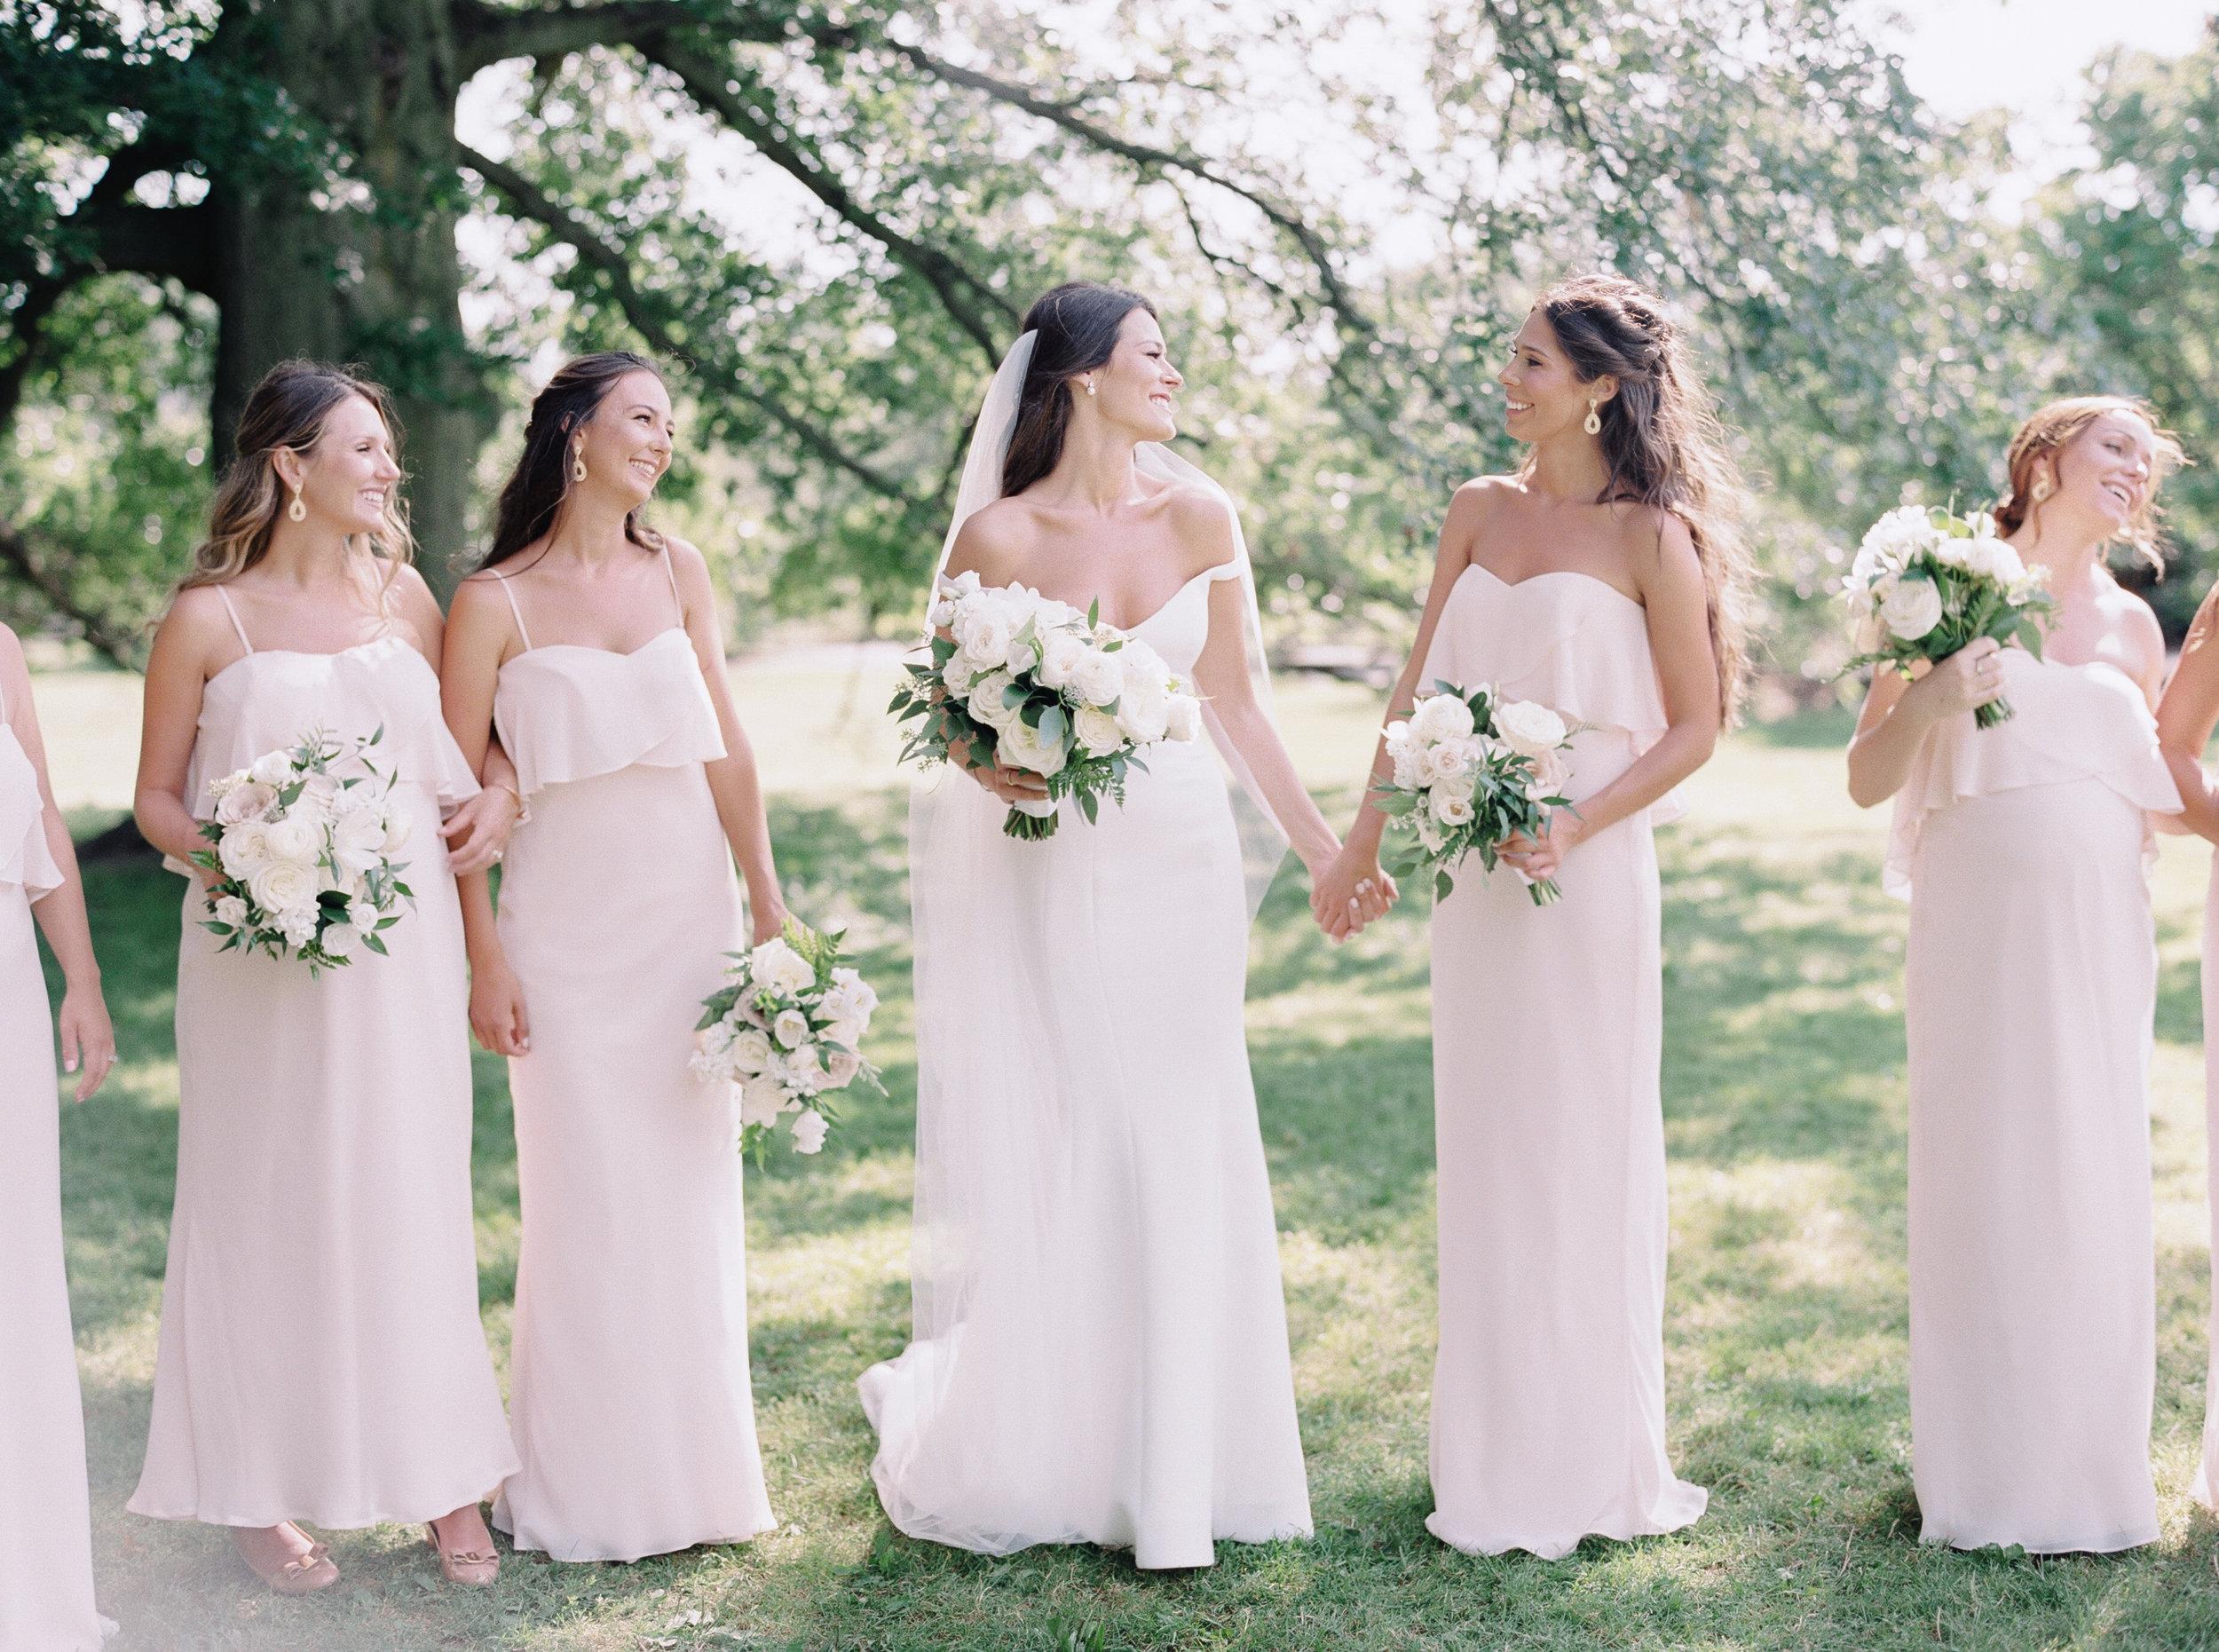 gracewood-kurtz-best-toronto-wedding-photographer-soft-airy-bloom-co-shaw-3.jpg